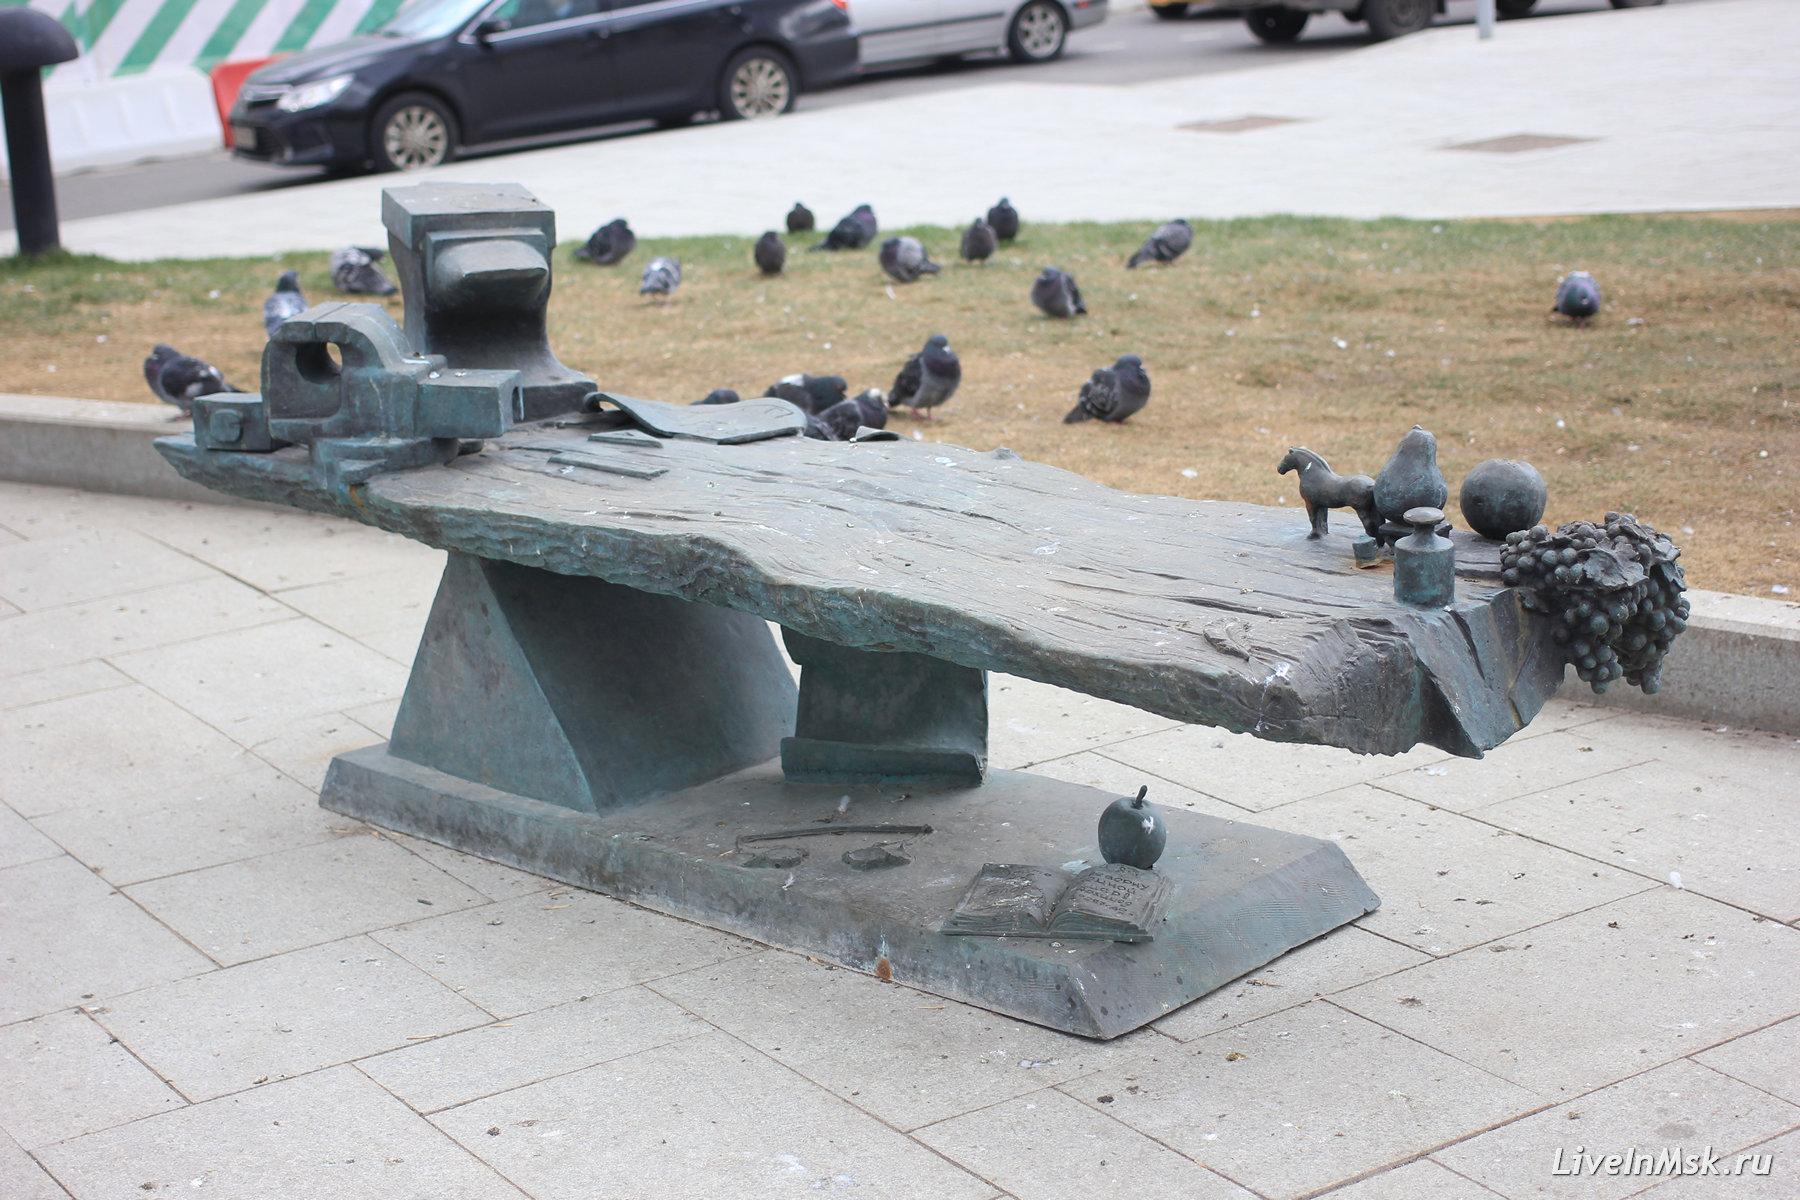 Стеренский бульвар, фото 2015 года